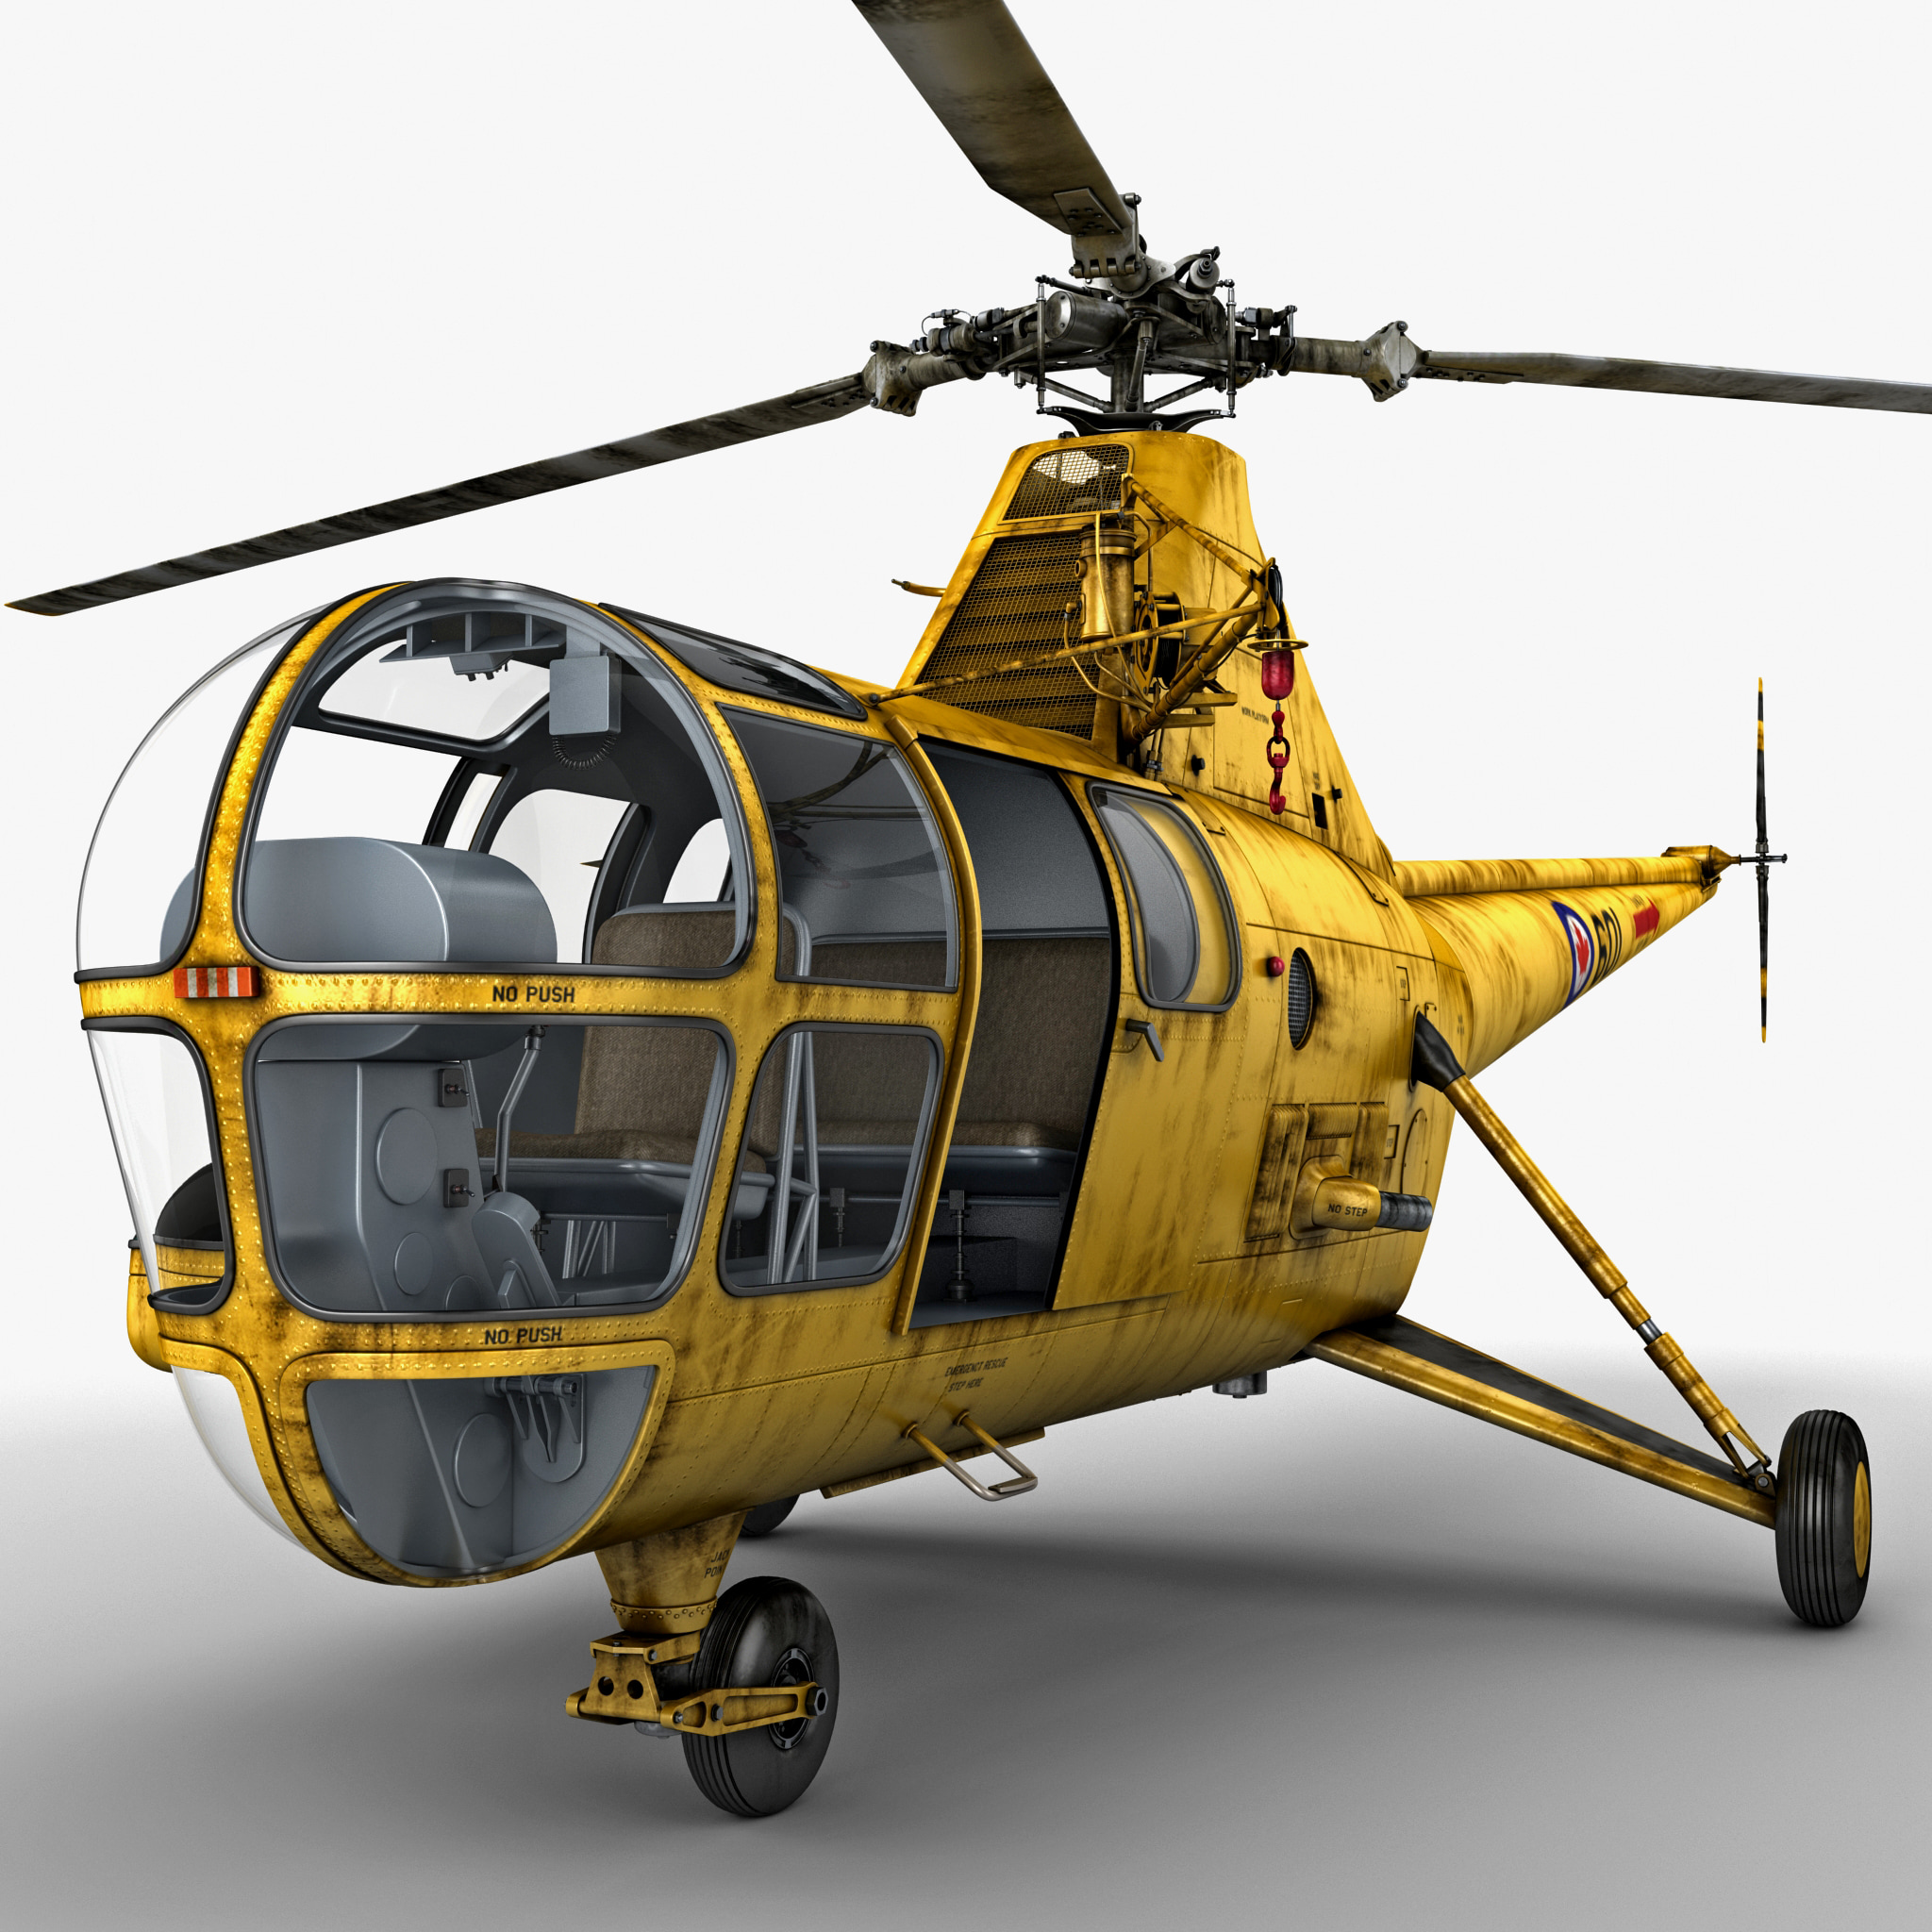 Sikorsky H-5 2 Rigged